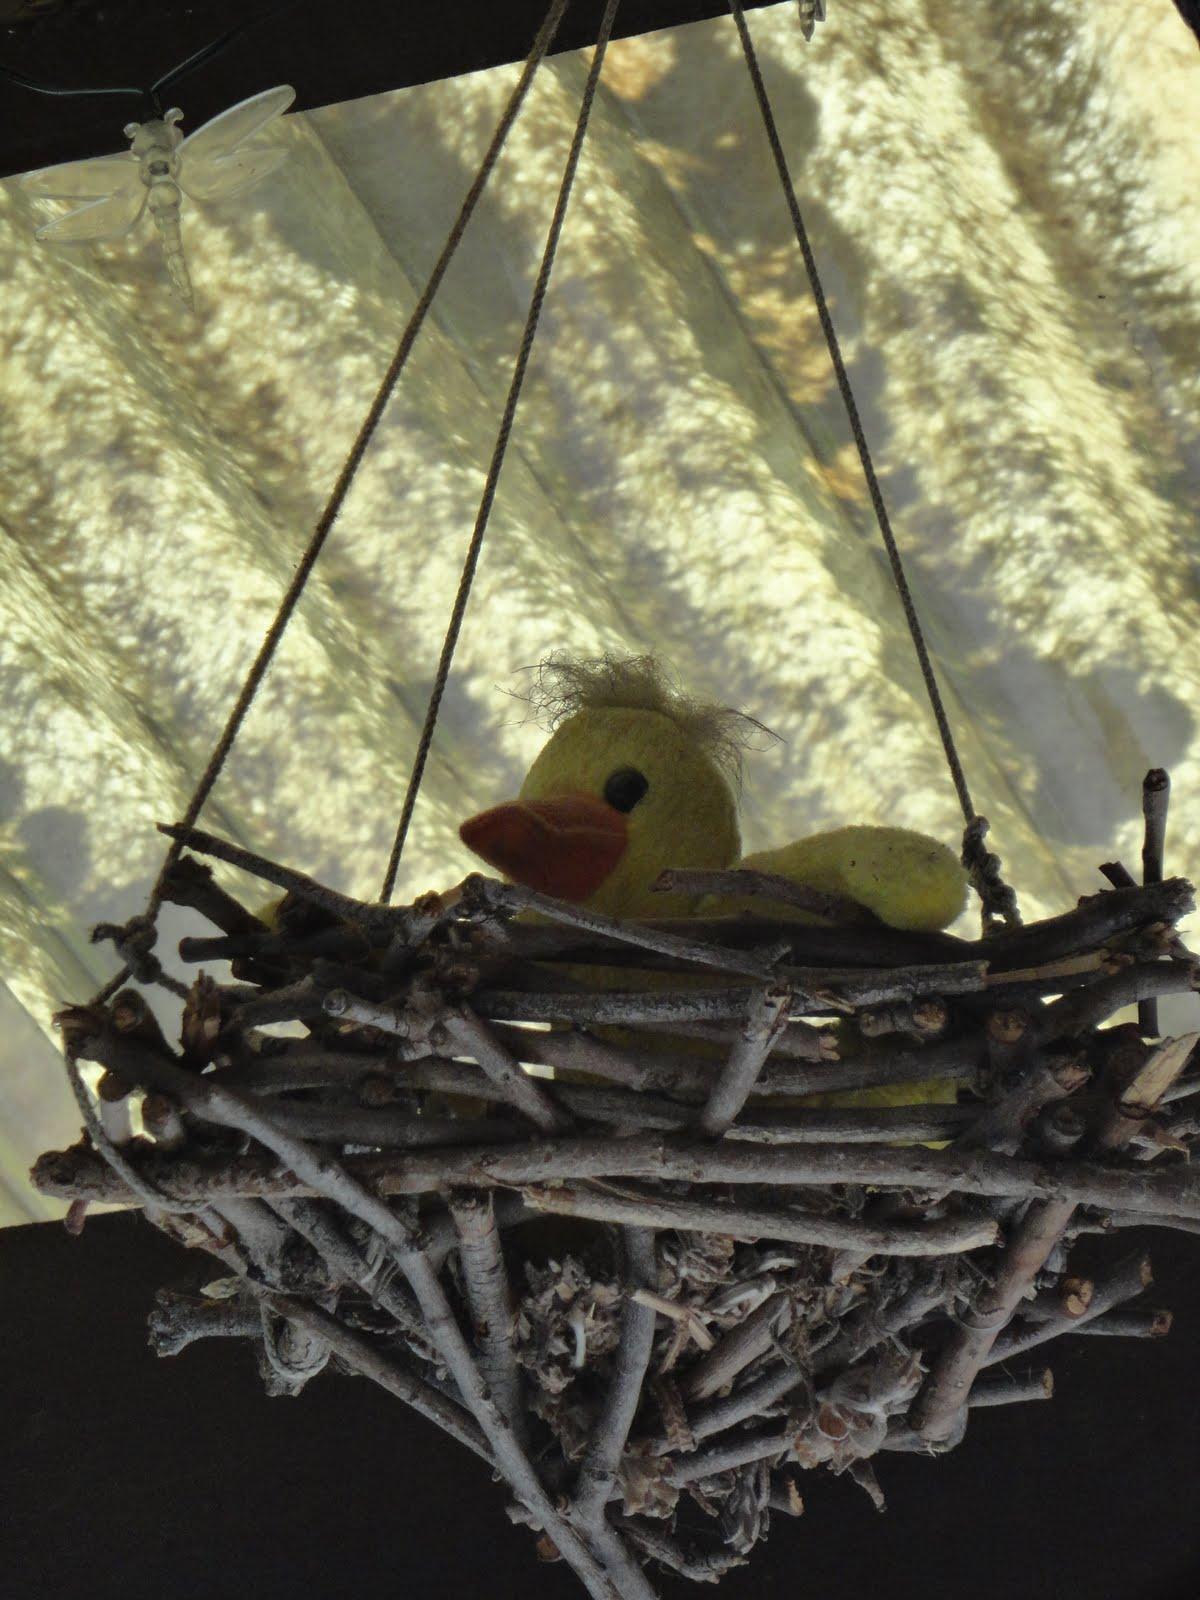 how to stop birds hanging under the carporr